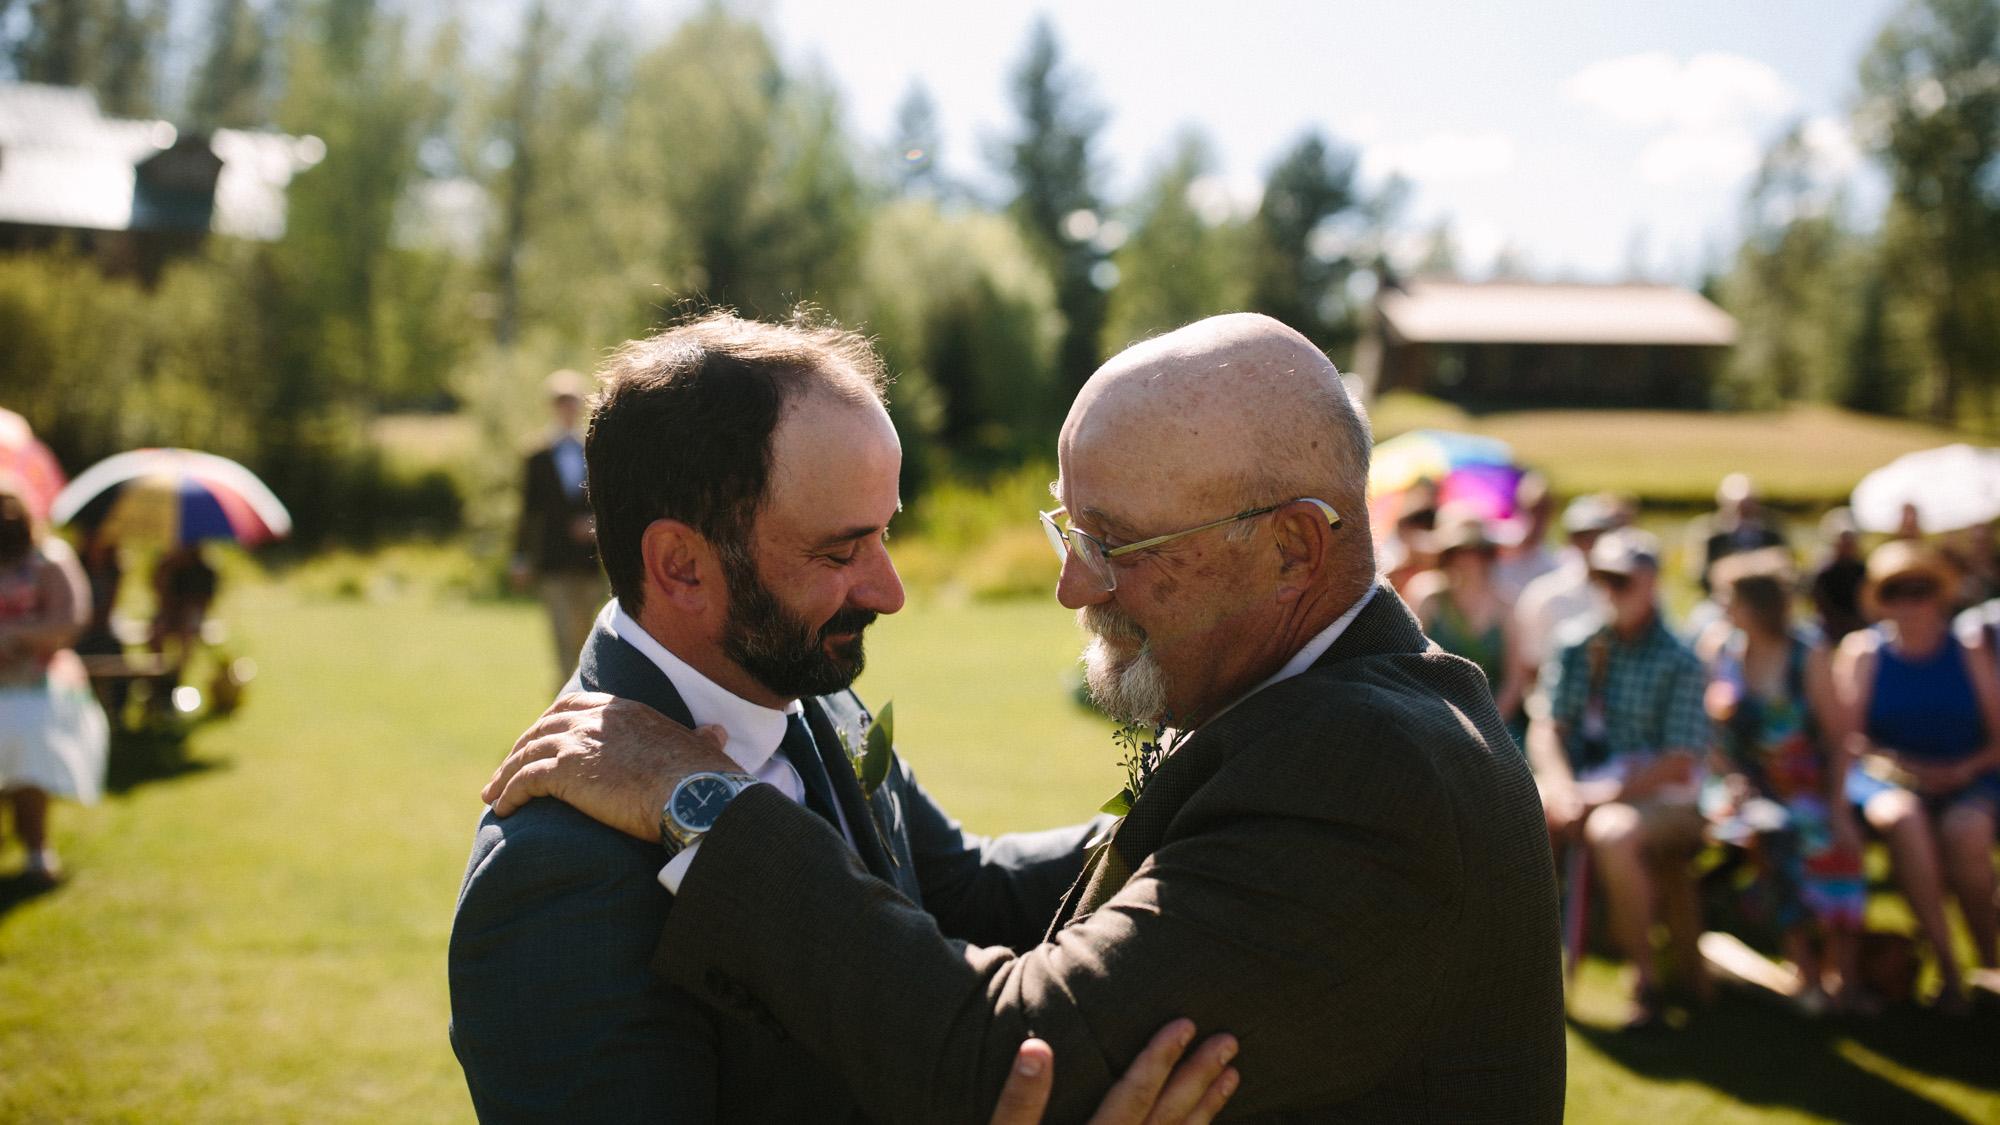 Montana_Wedding_Photos_alec_vanderboom-0080.jpg